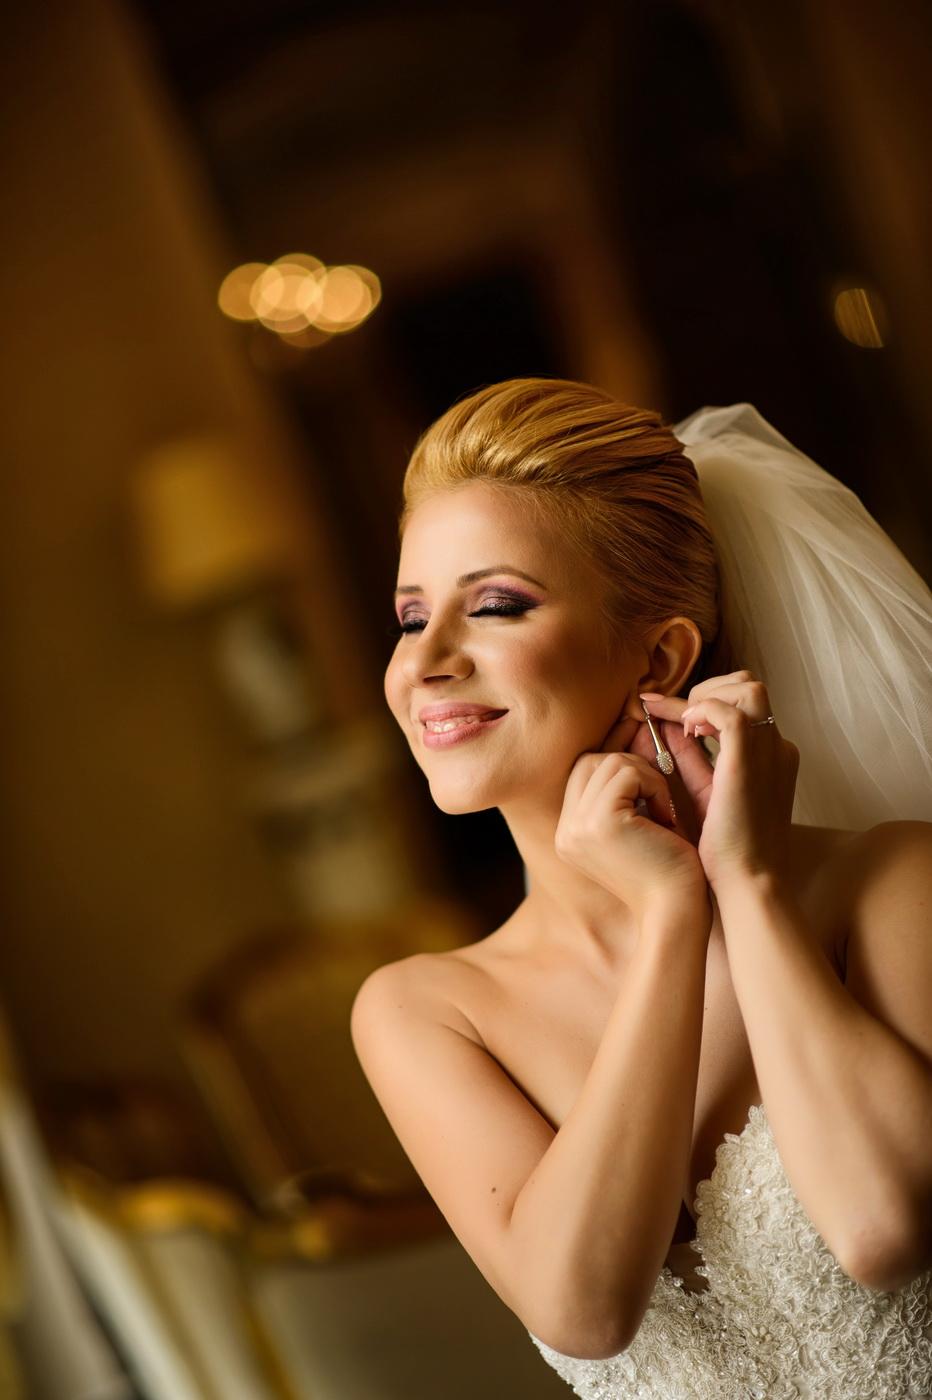 Destination Wedding Photographer_Marian Sterea_047.jpg